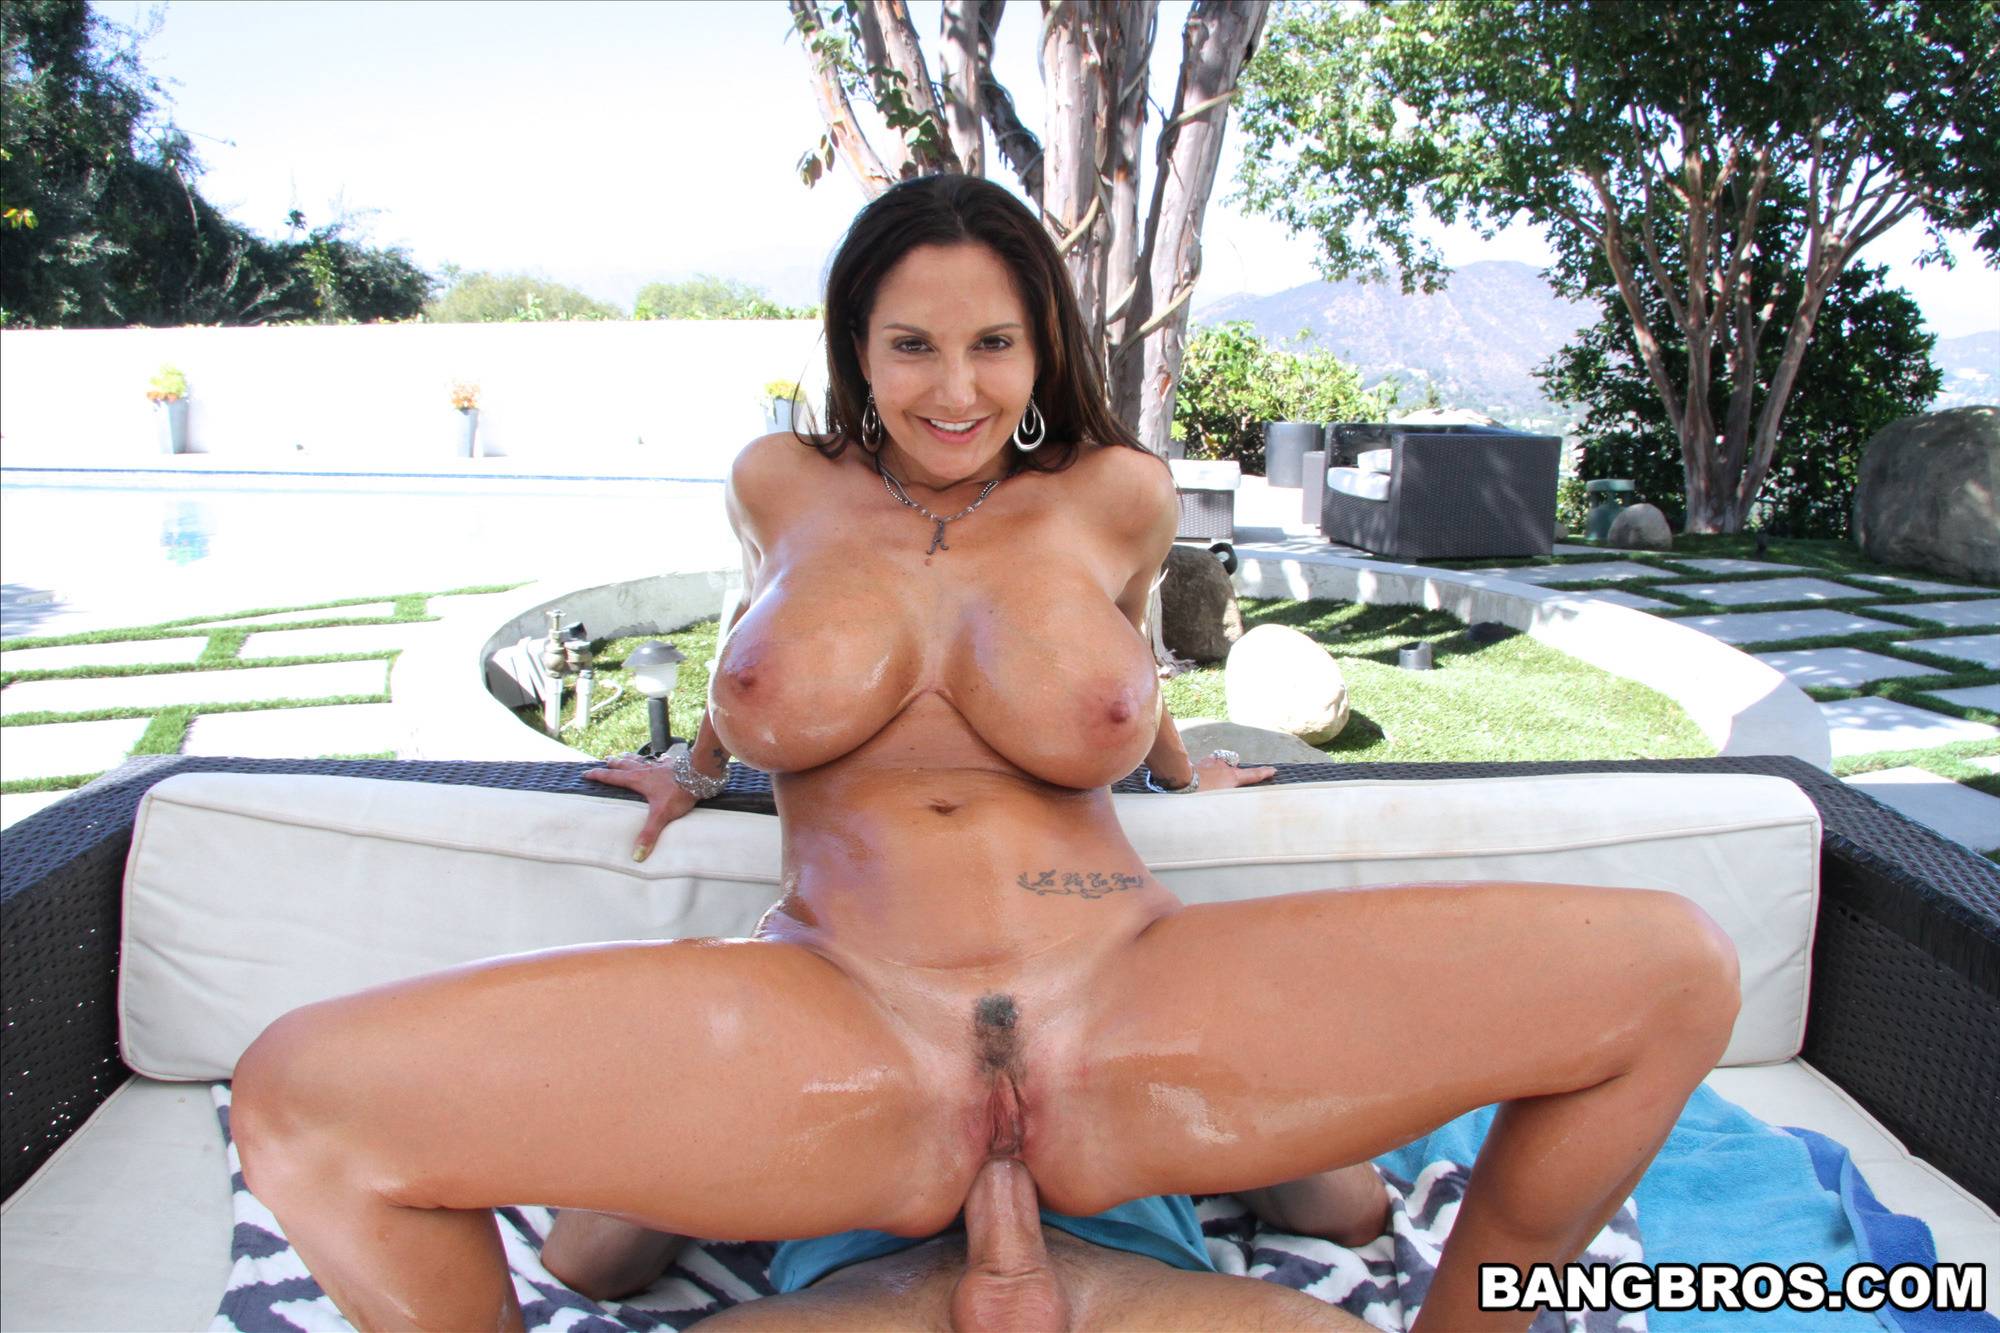 Big Tits Bouncing Cowgirl